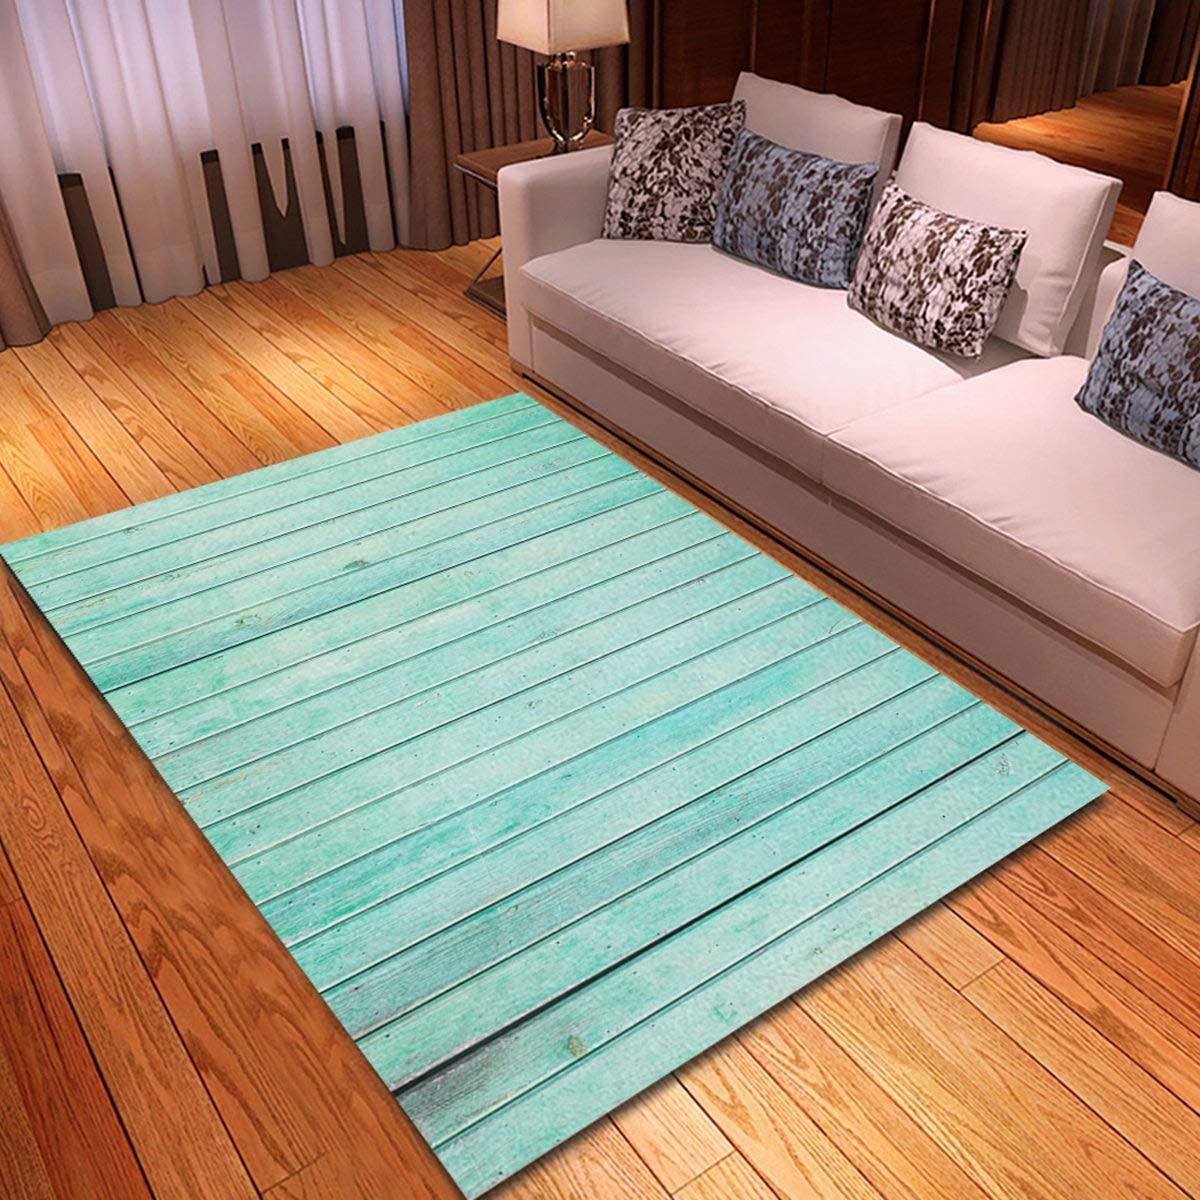 rouihot Non-Slip Area Rug 3'x 5' Green Wall Mint Painted Wood Panels Color Aqua Pastel Rugs Carpet for Classroom Living Room Bedroom Dining Kindergarten Room